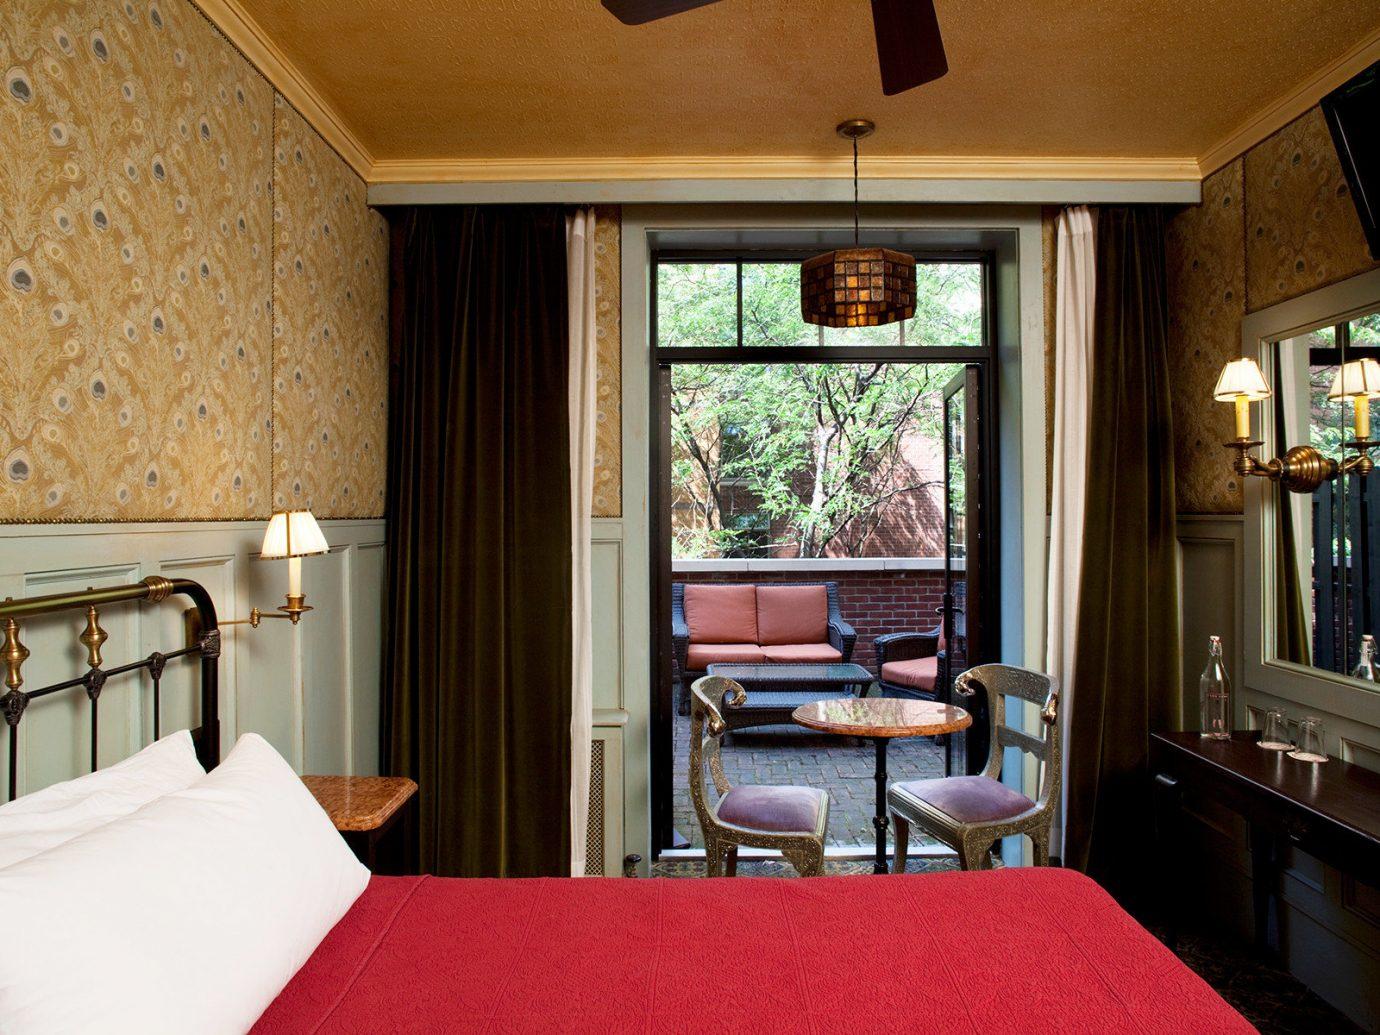 Bedroom Hotels Suite indoor bed window room floor property building estate cottage home interior design real estate Resort